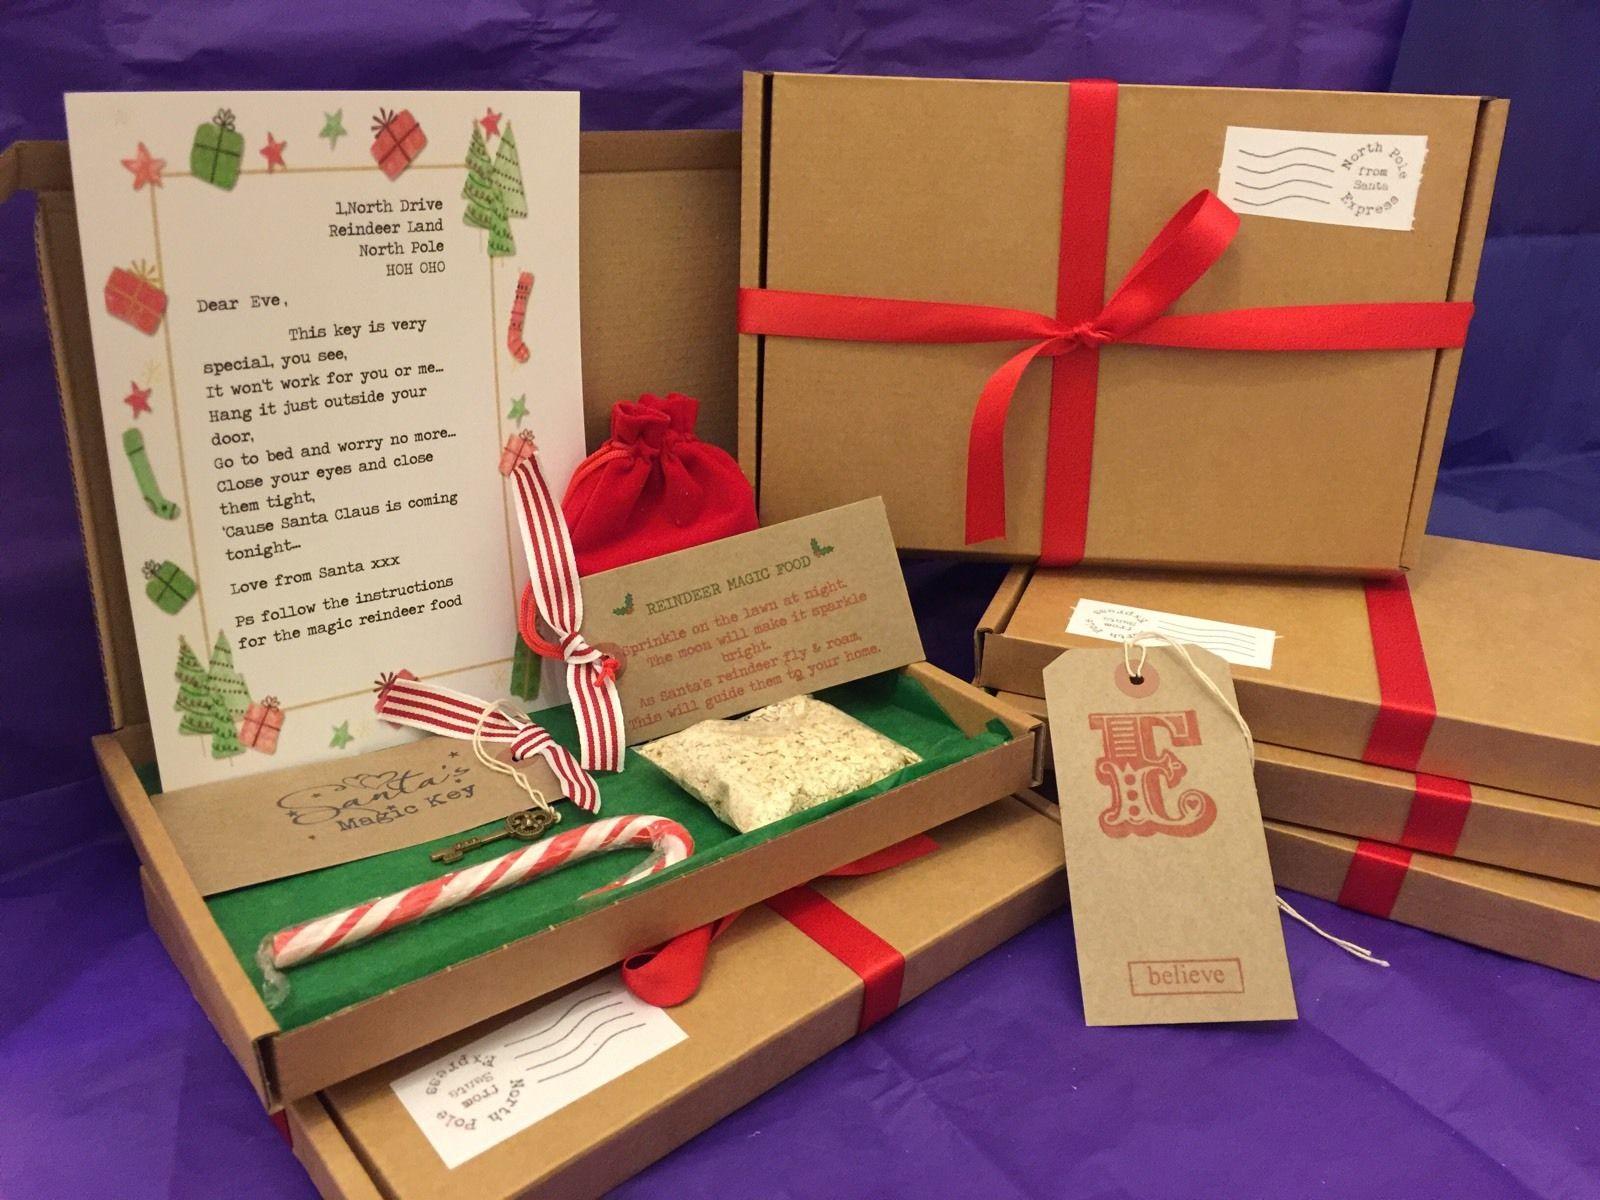 Santa christmas eve box personalised a5 size letter magic key santa christmas eve box personalised a5 size letter magic key reindeer food spiritdancerdesigns Choice Image